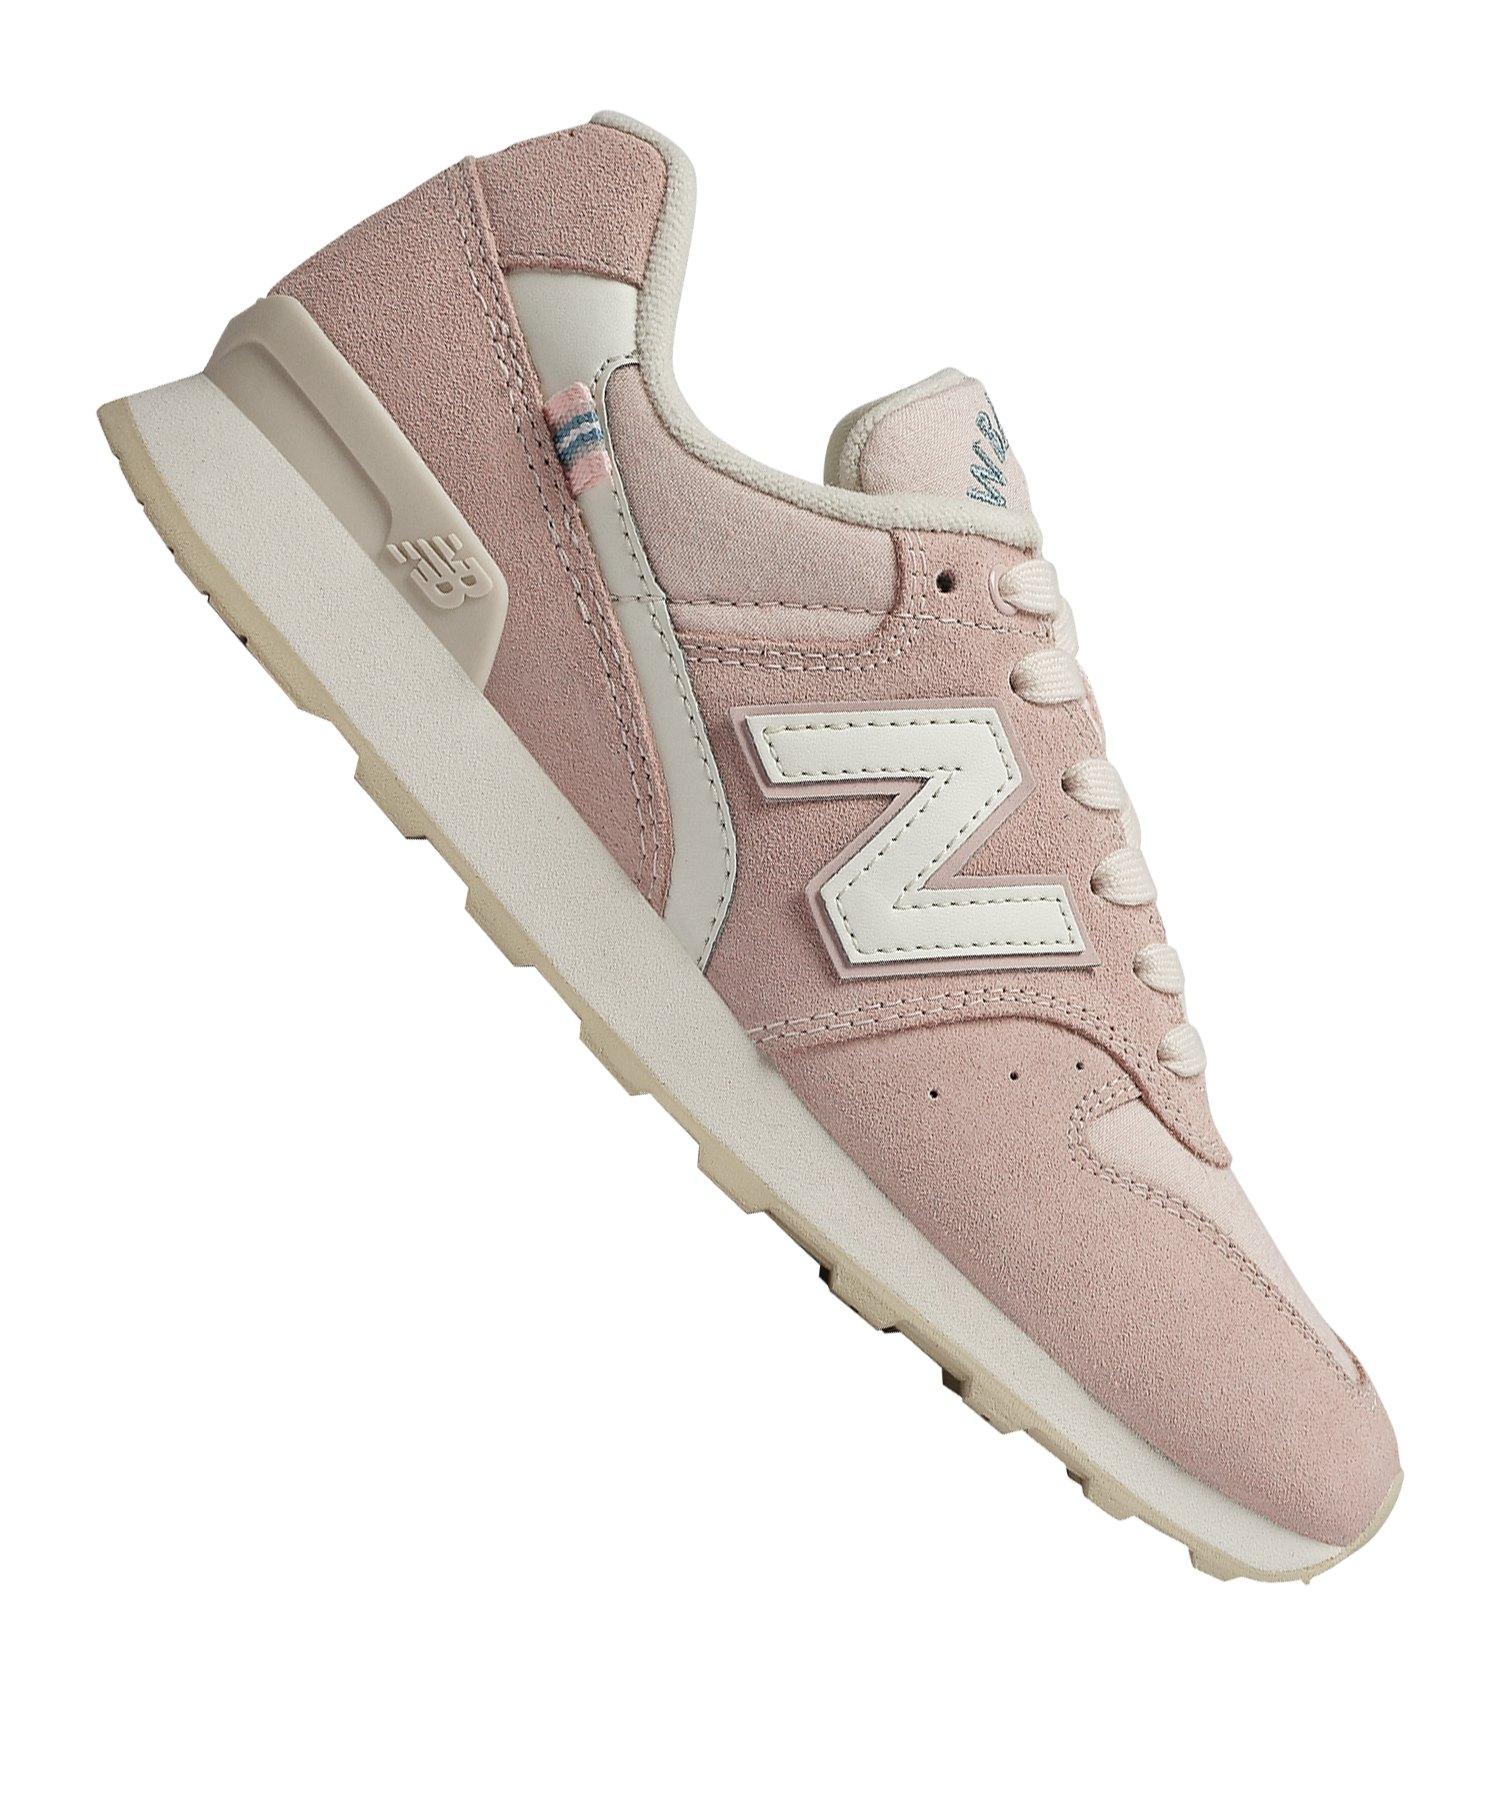 New Balance Damen Suede 996 Sneaker